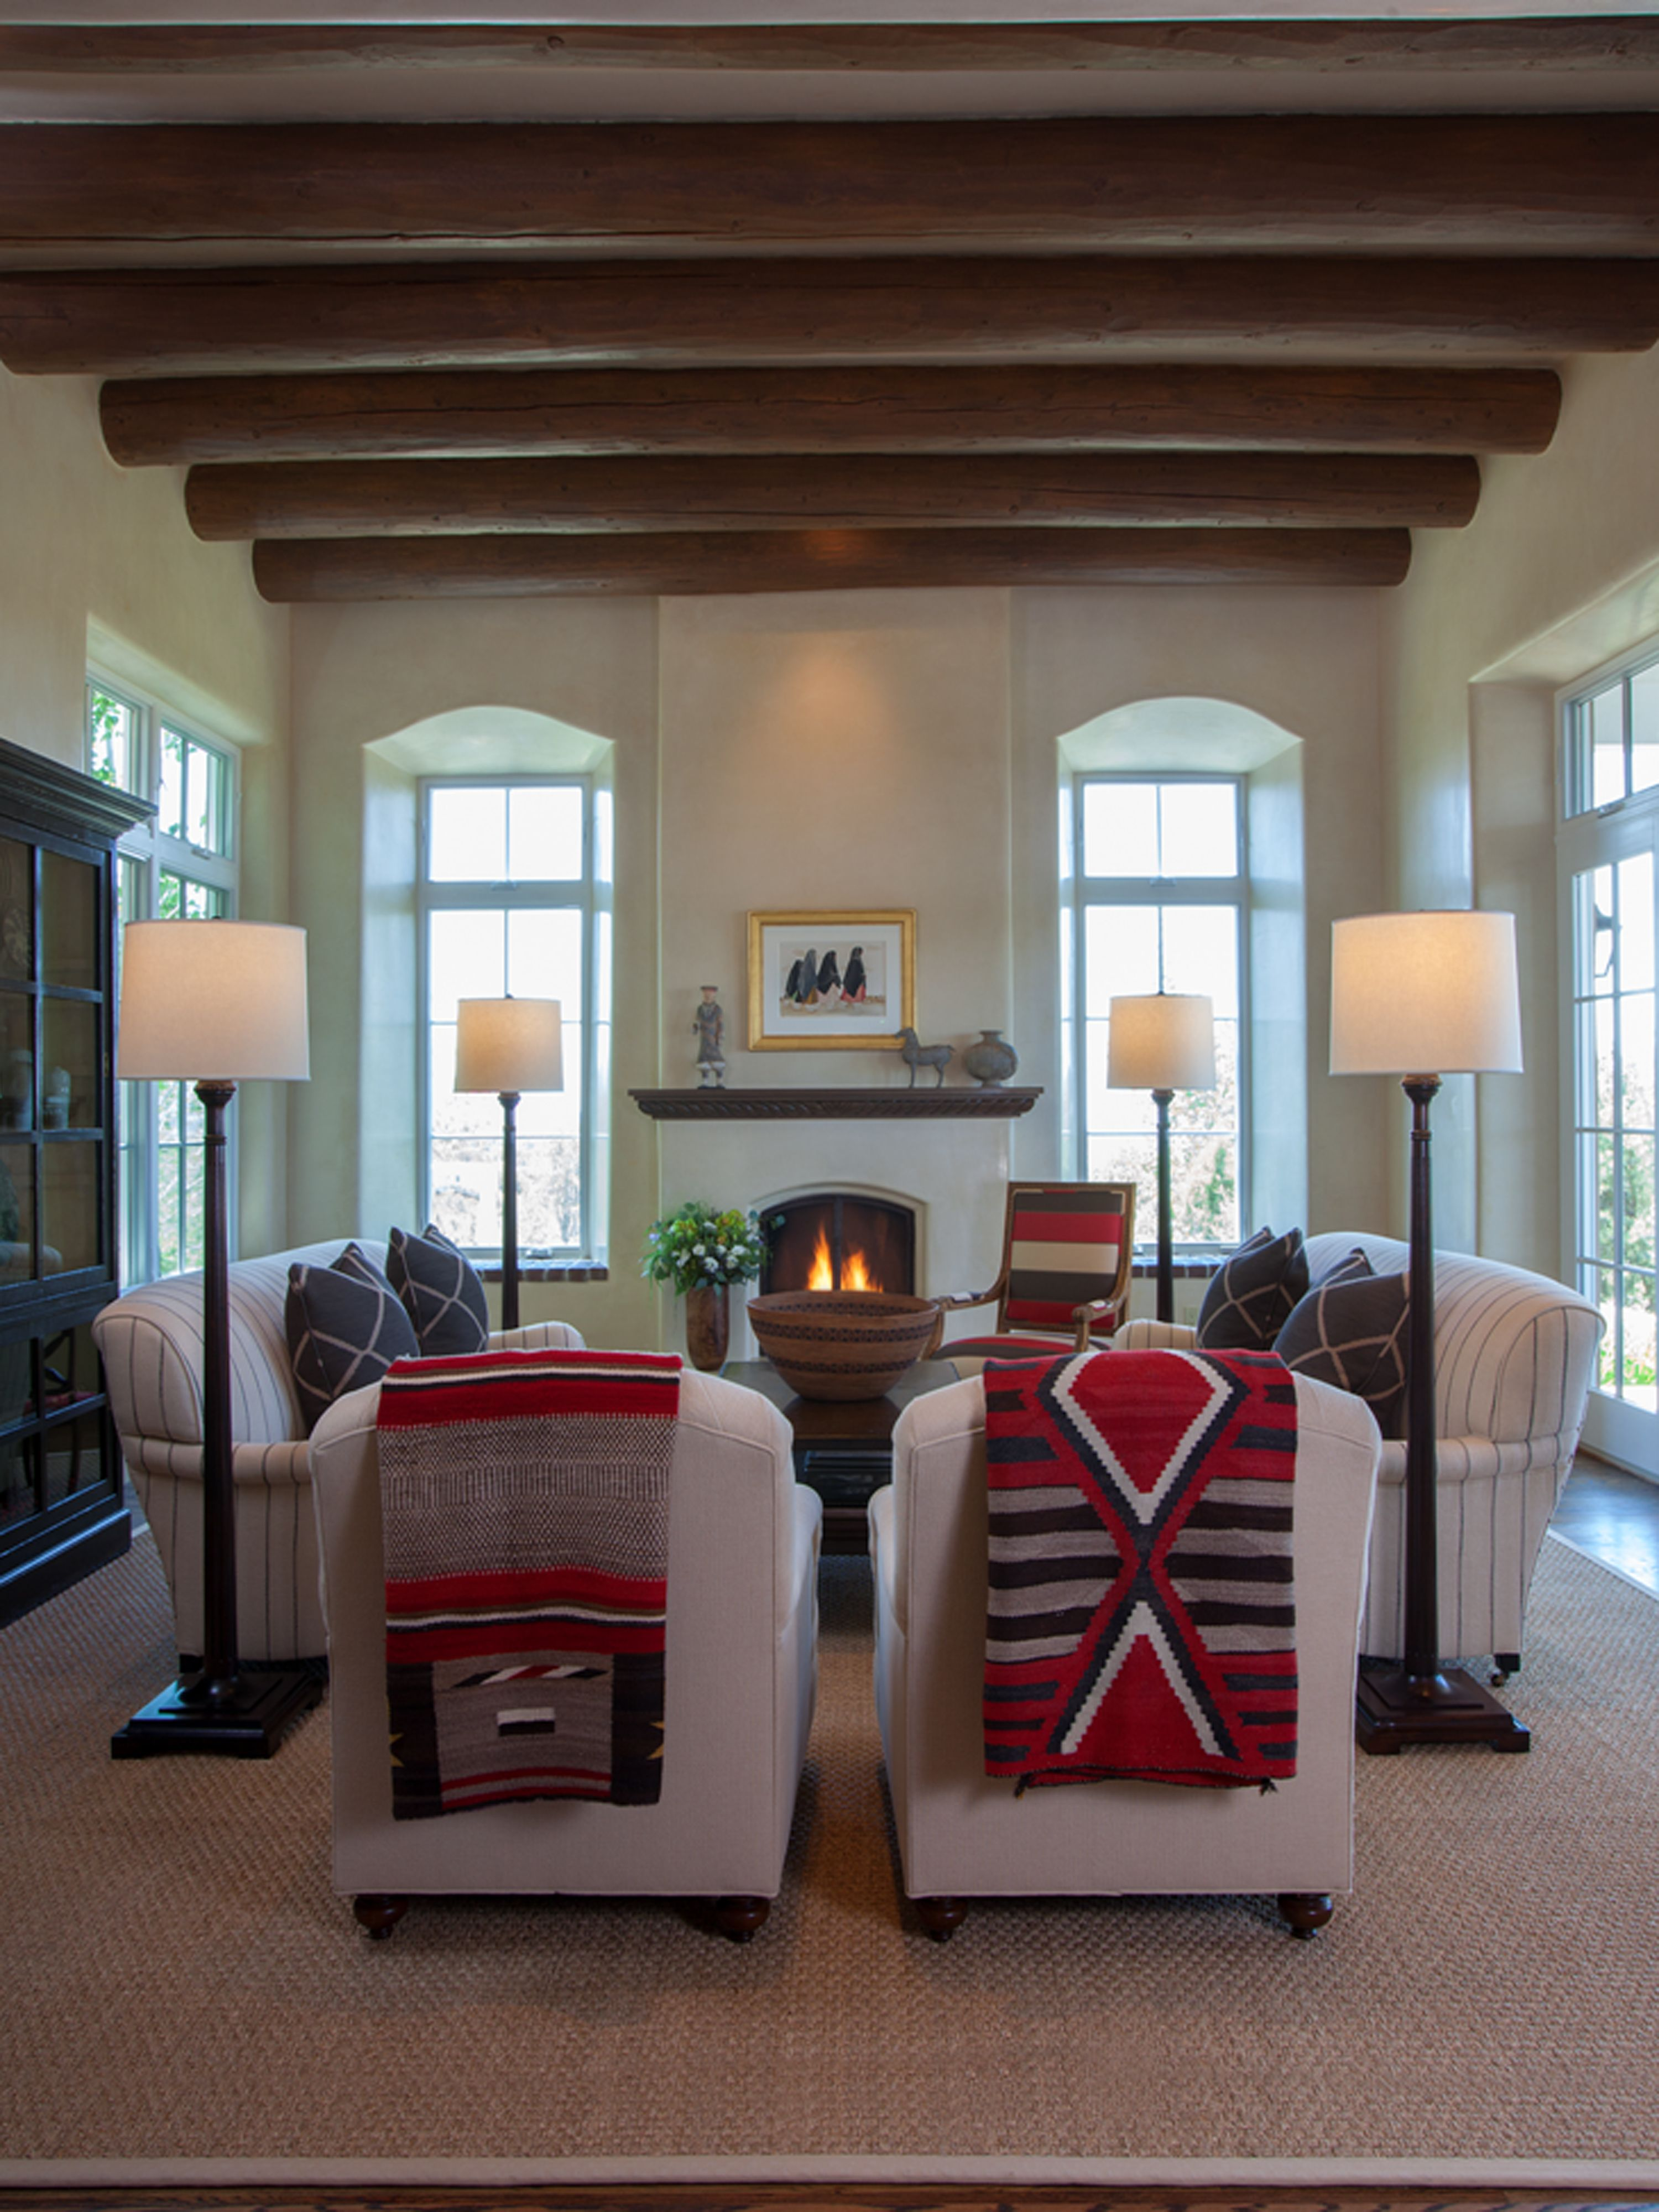 Step Inside A Stunning Adobe Home In Santa Fe Adobe House New